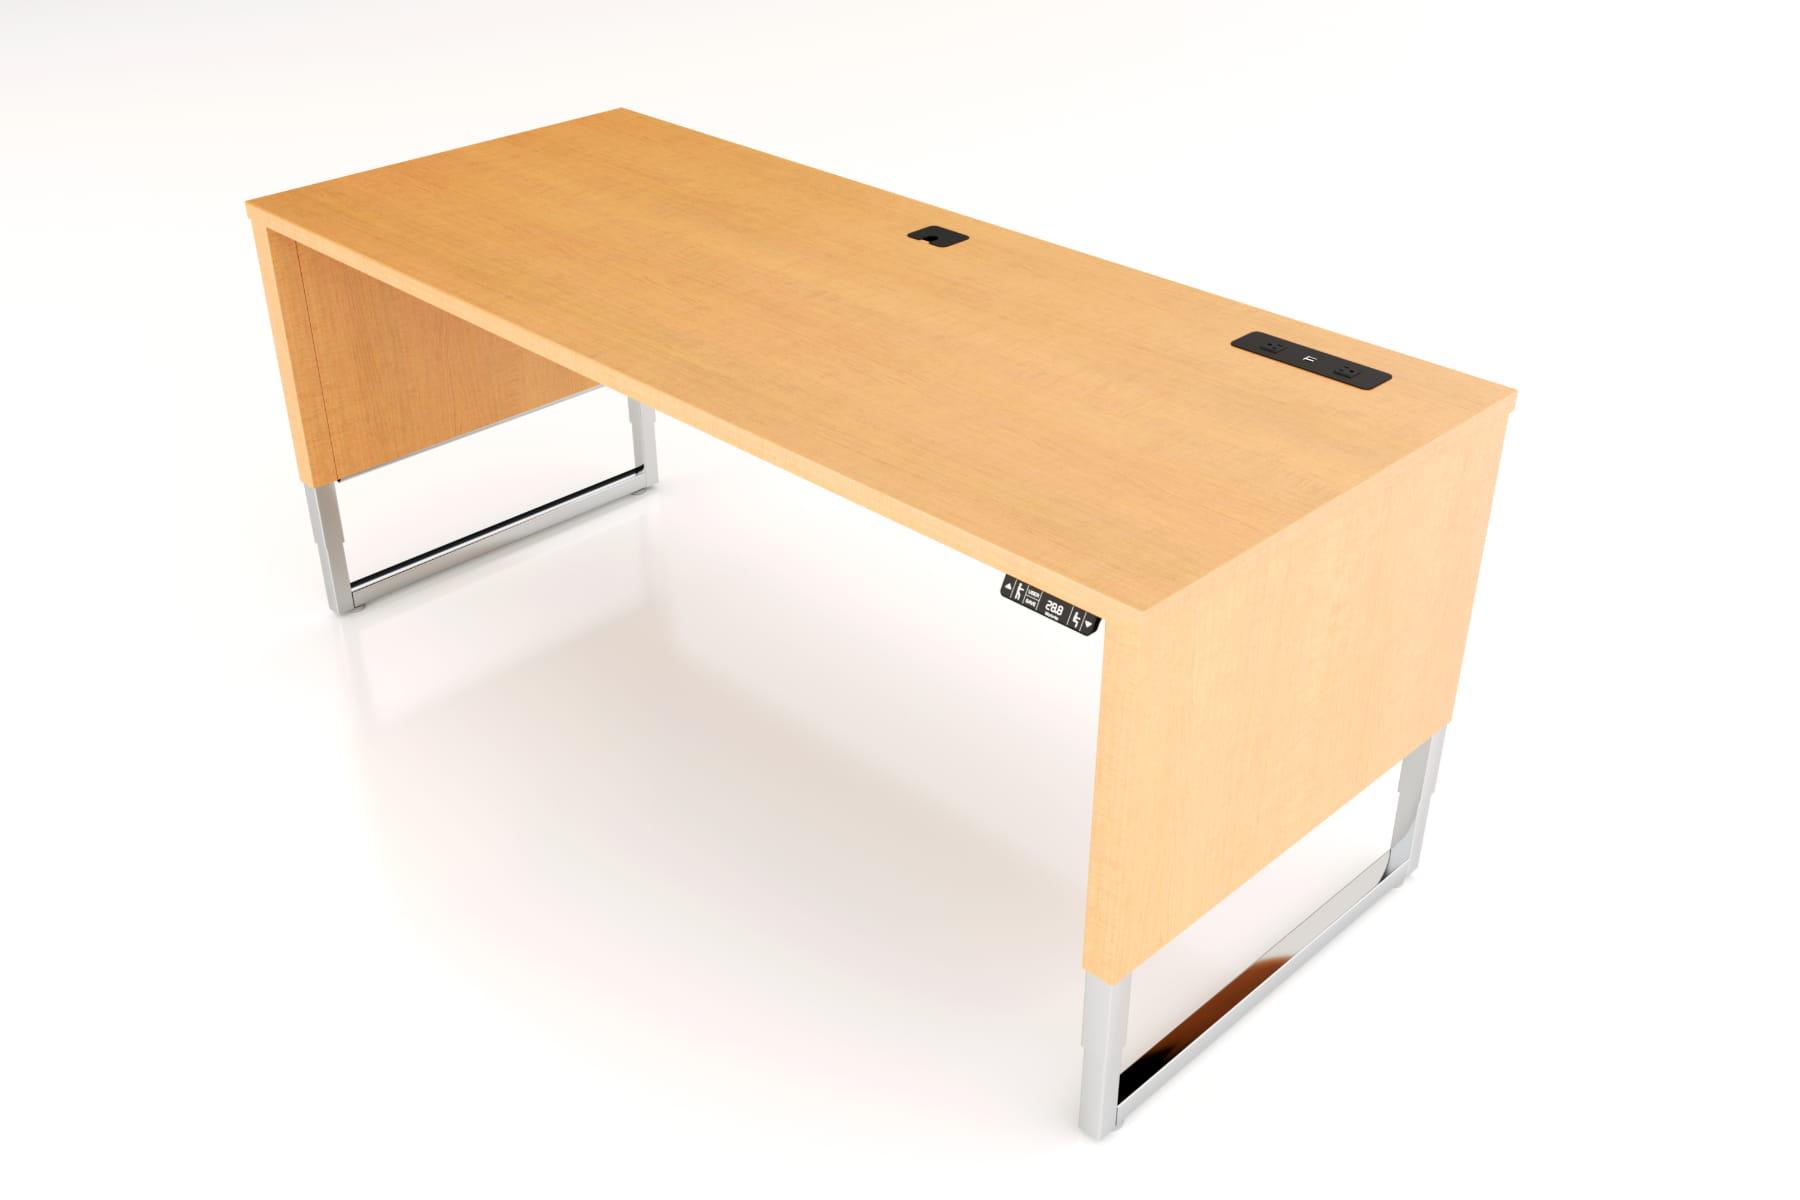 Advent-Desk-ADV-7230-CH-Mid-Front